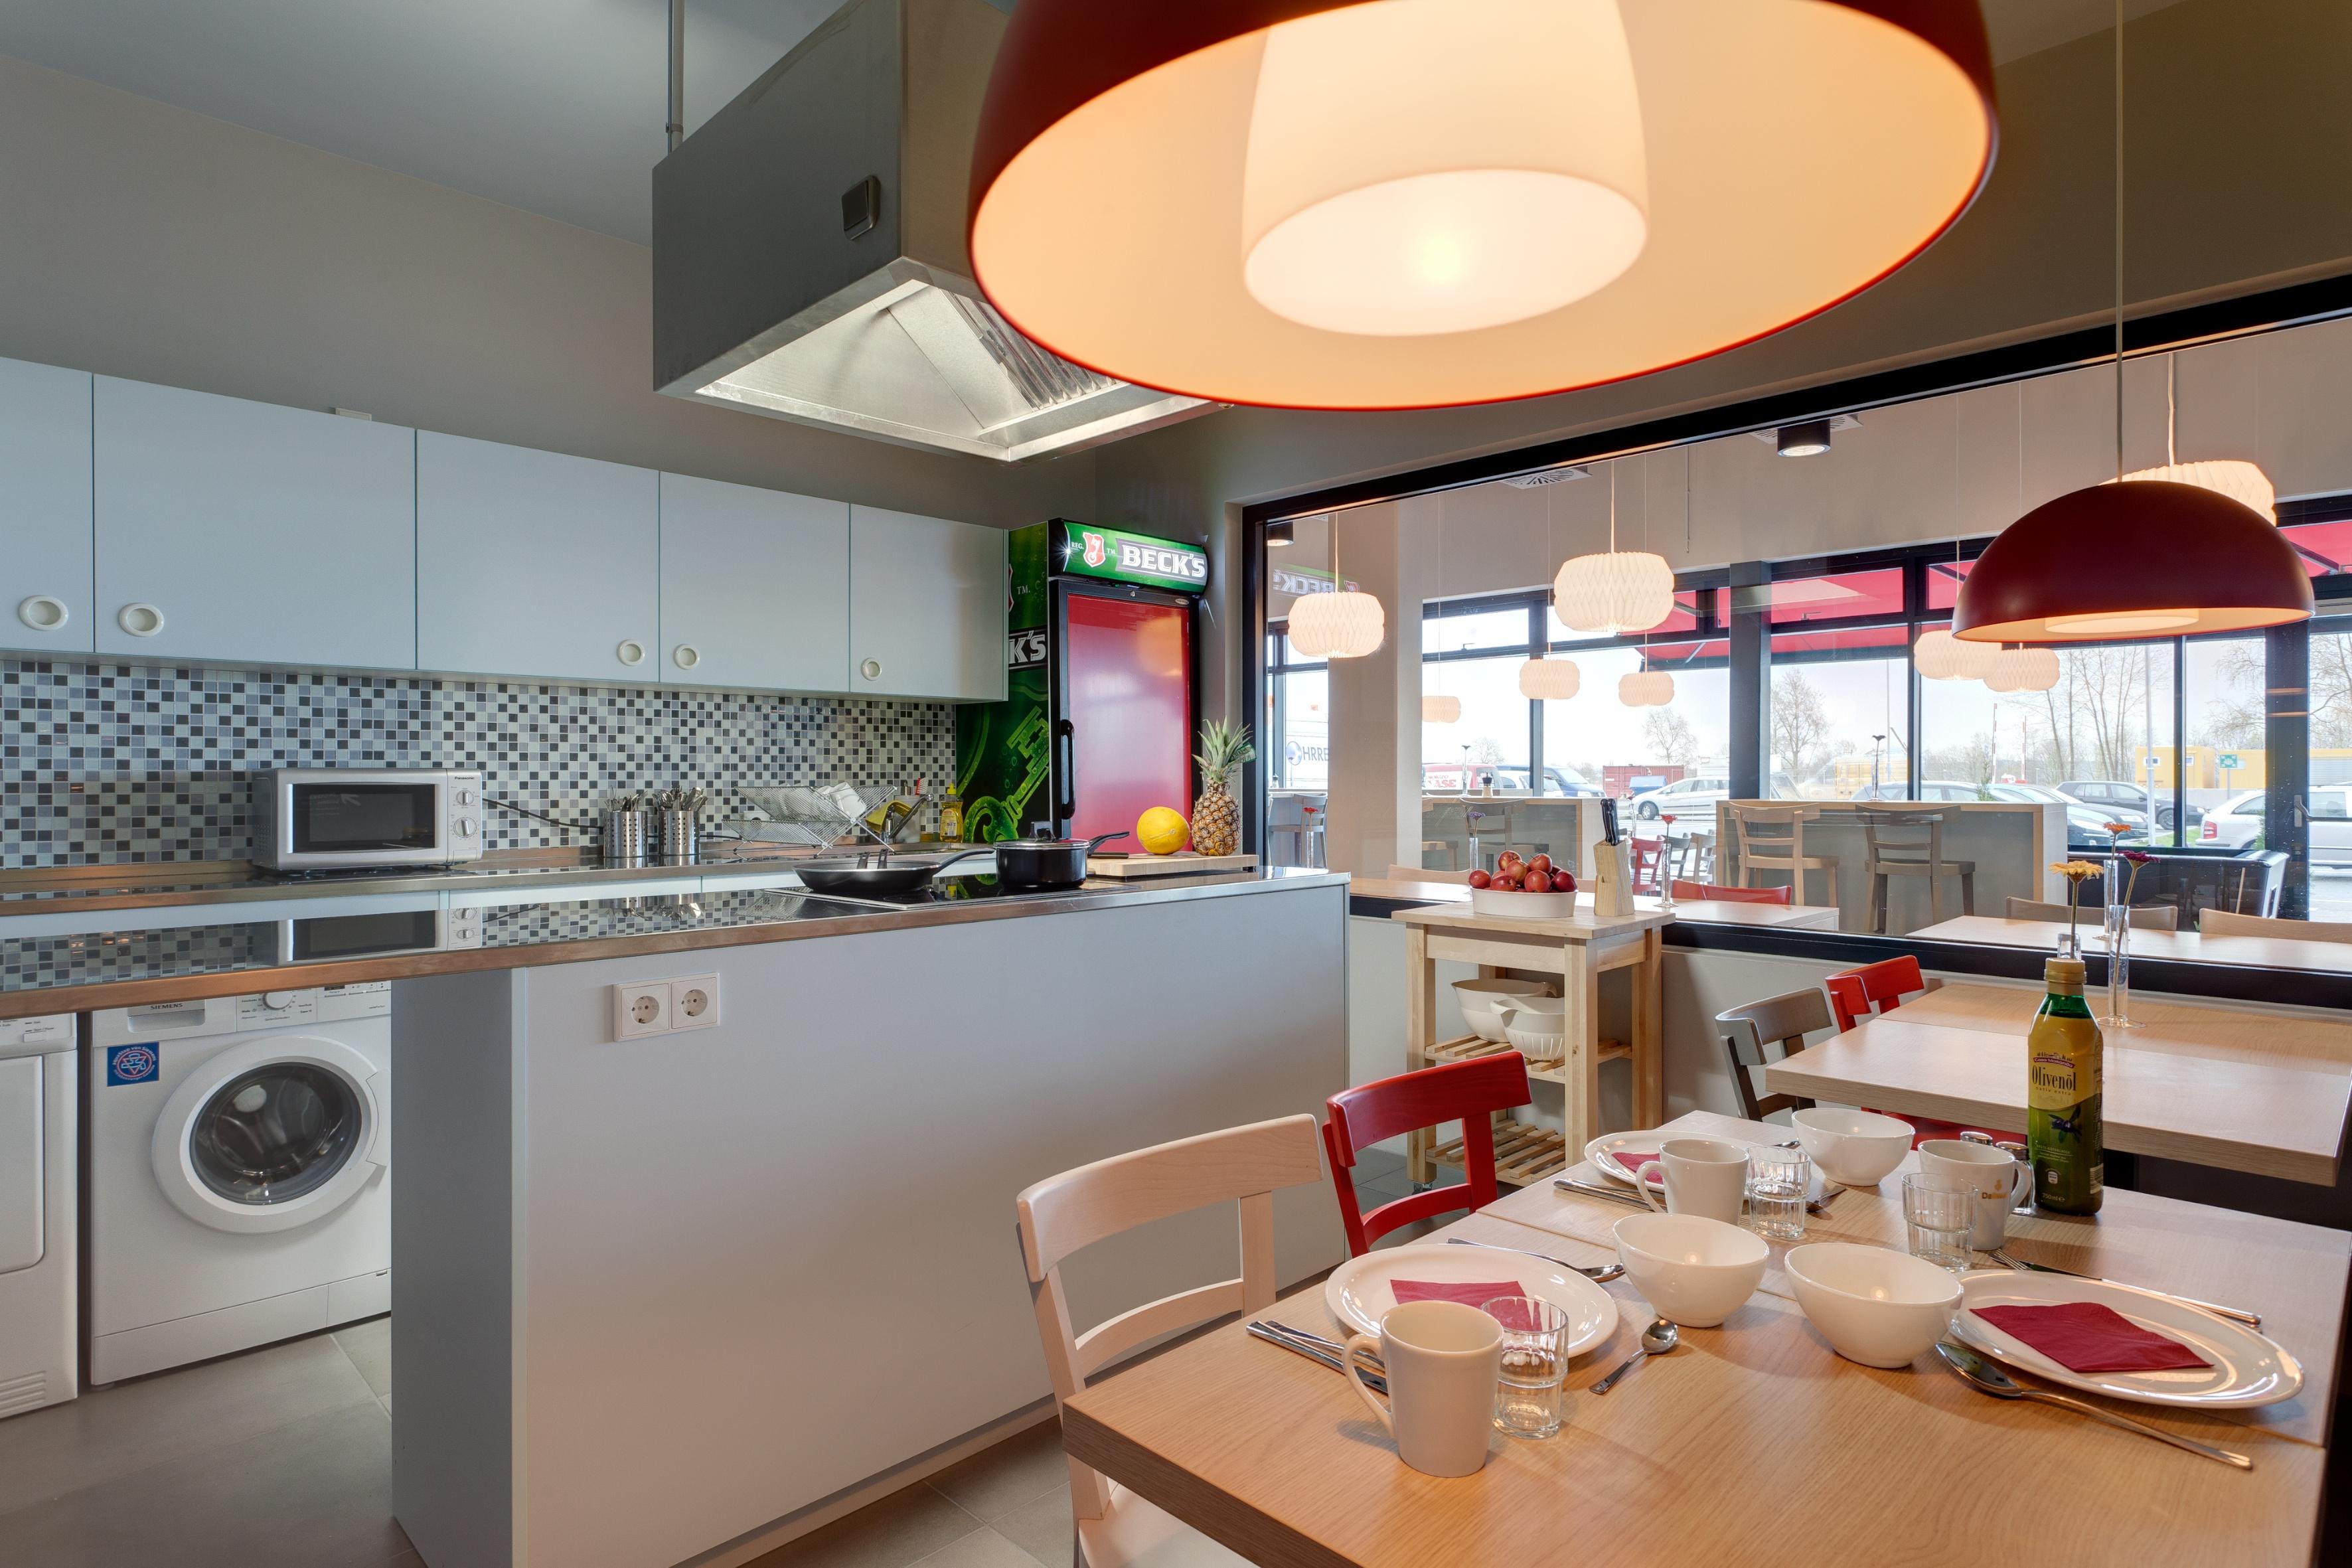 MEININGER Hotel Berlin Airport - Guest kitchen